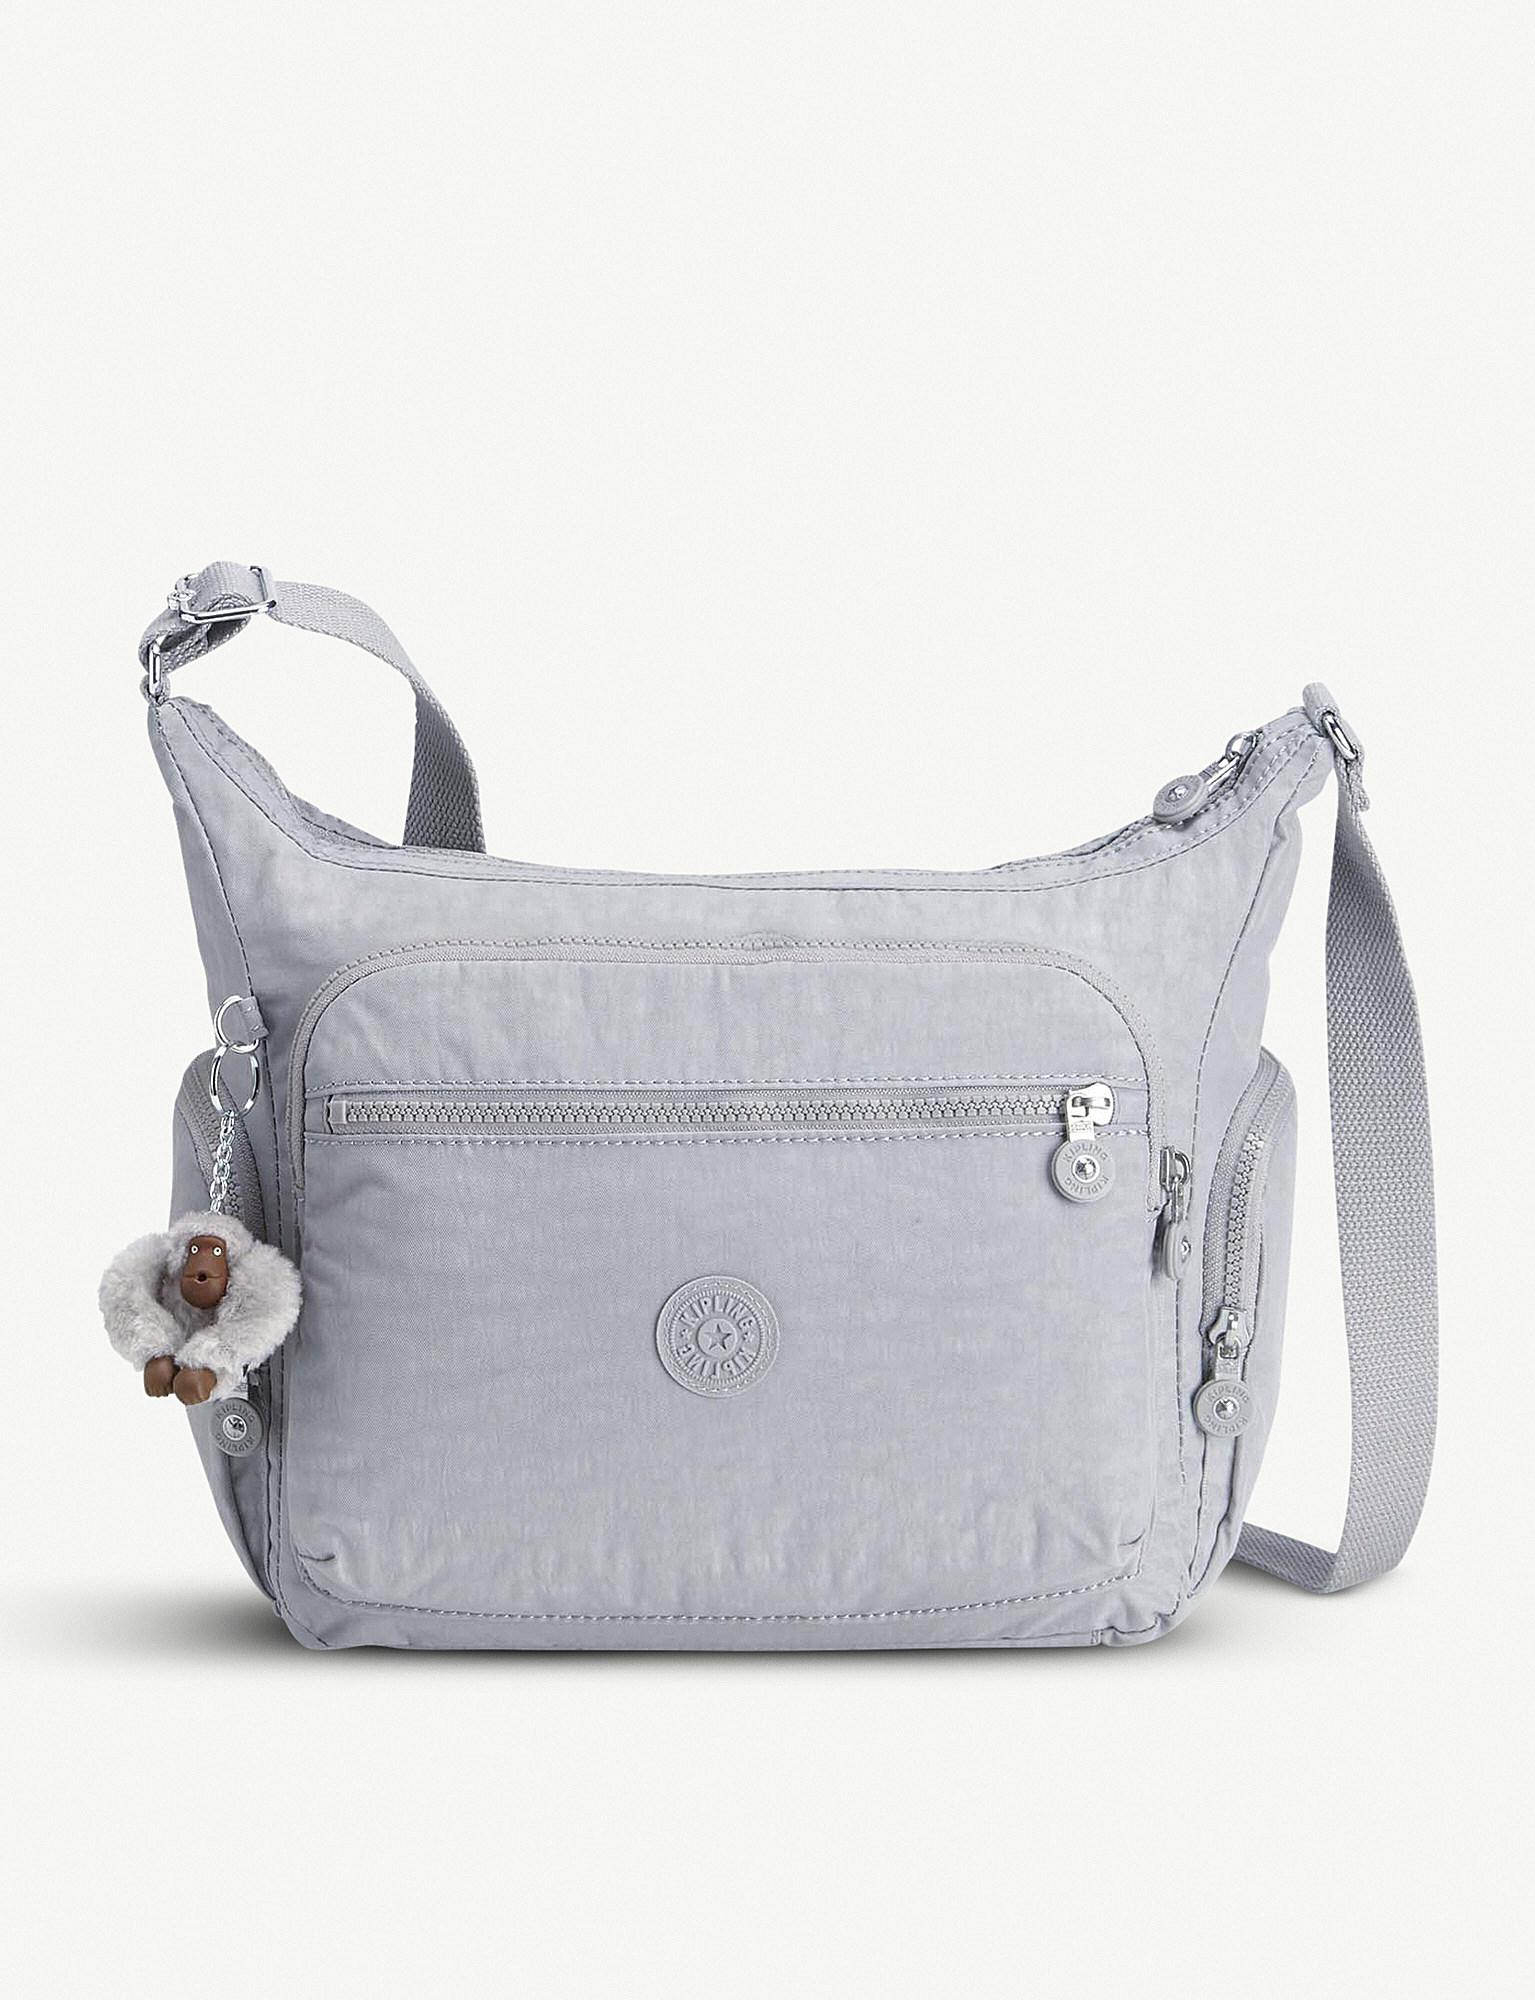 e14dea6763 Kipling Gabbie Large Nylon Shoulder Bag - Lyst